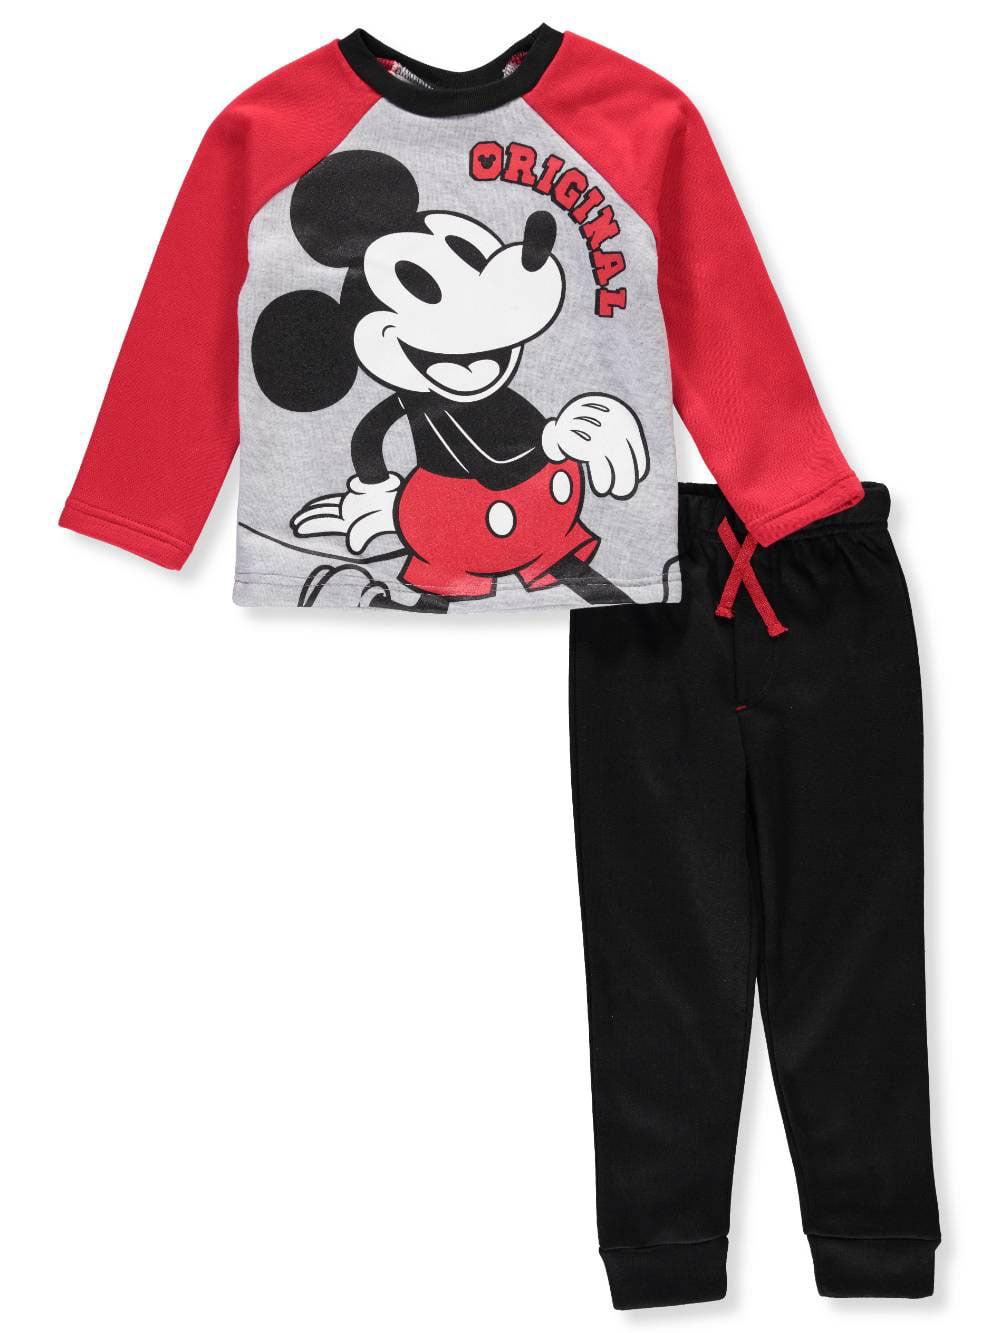 Disney Mickey Mouse Boys' 2-Piece Pants Set Outfit